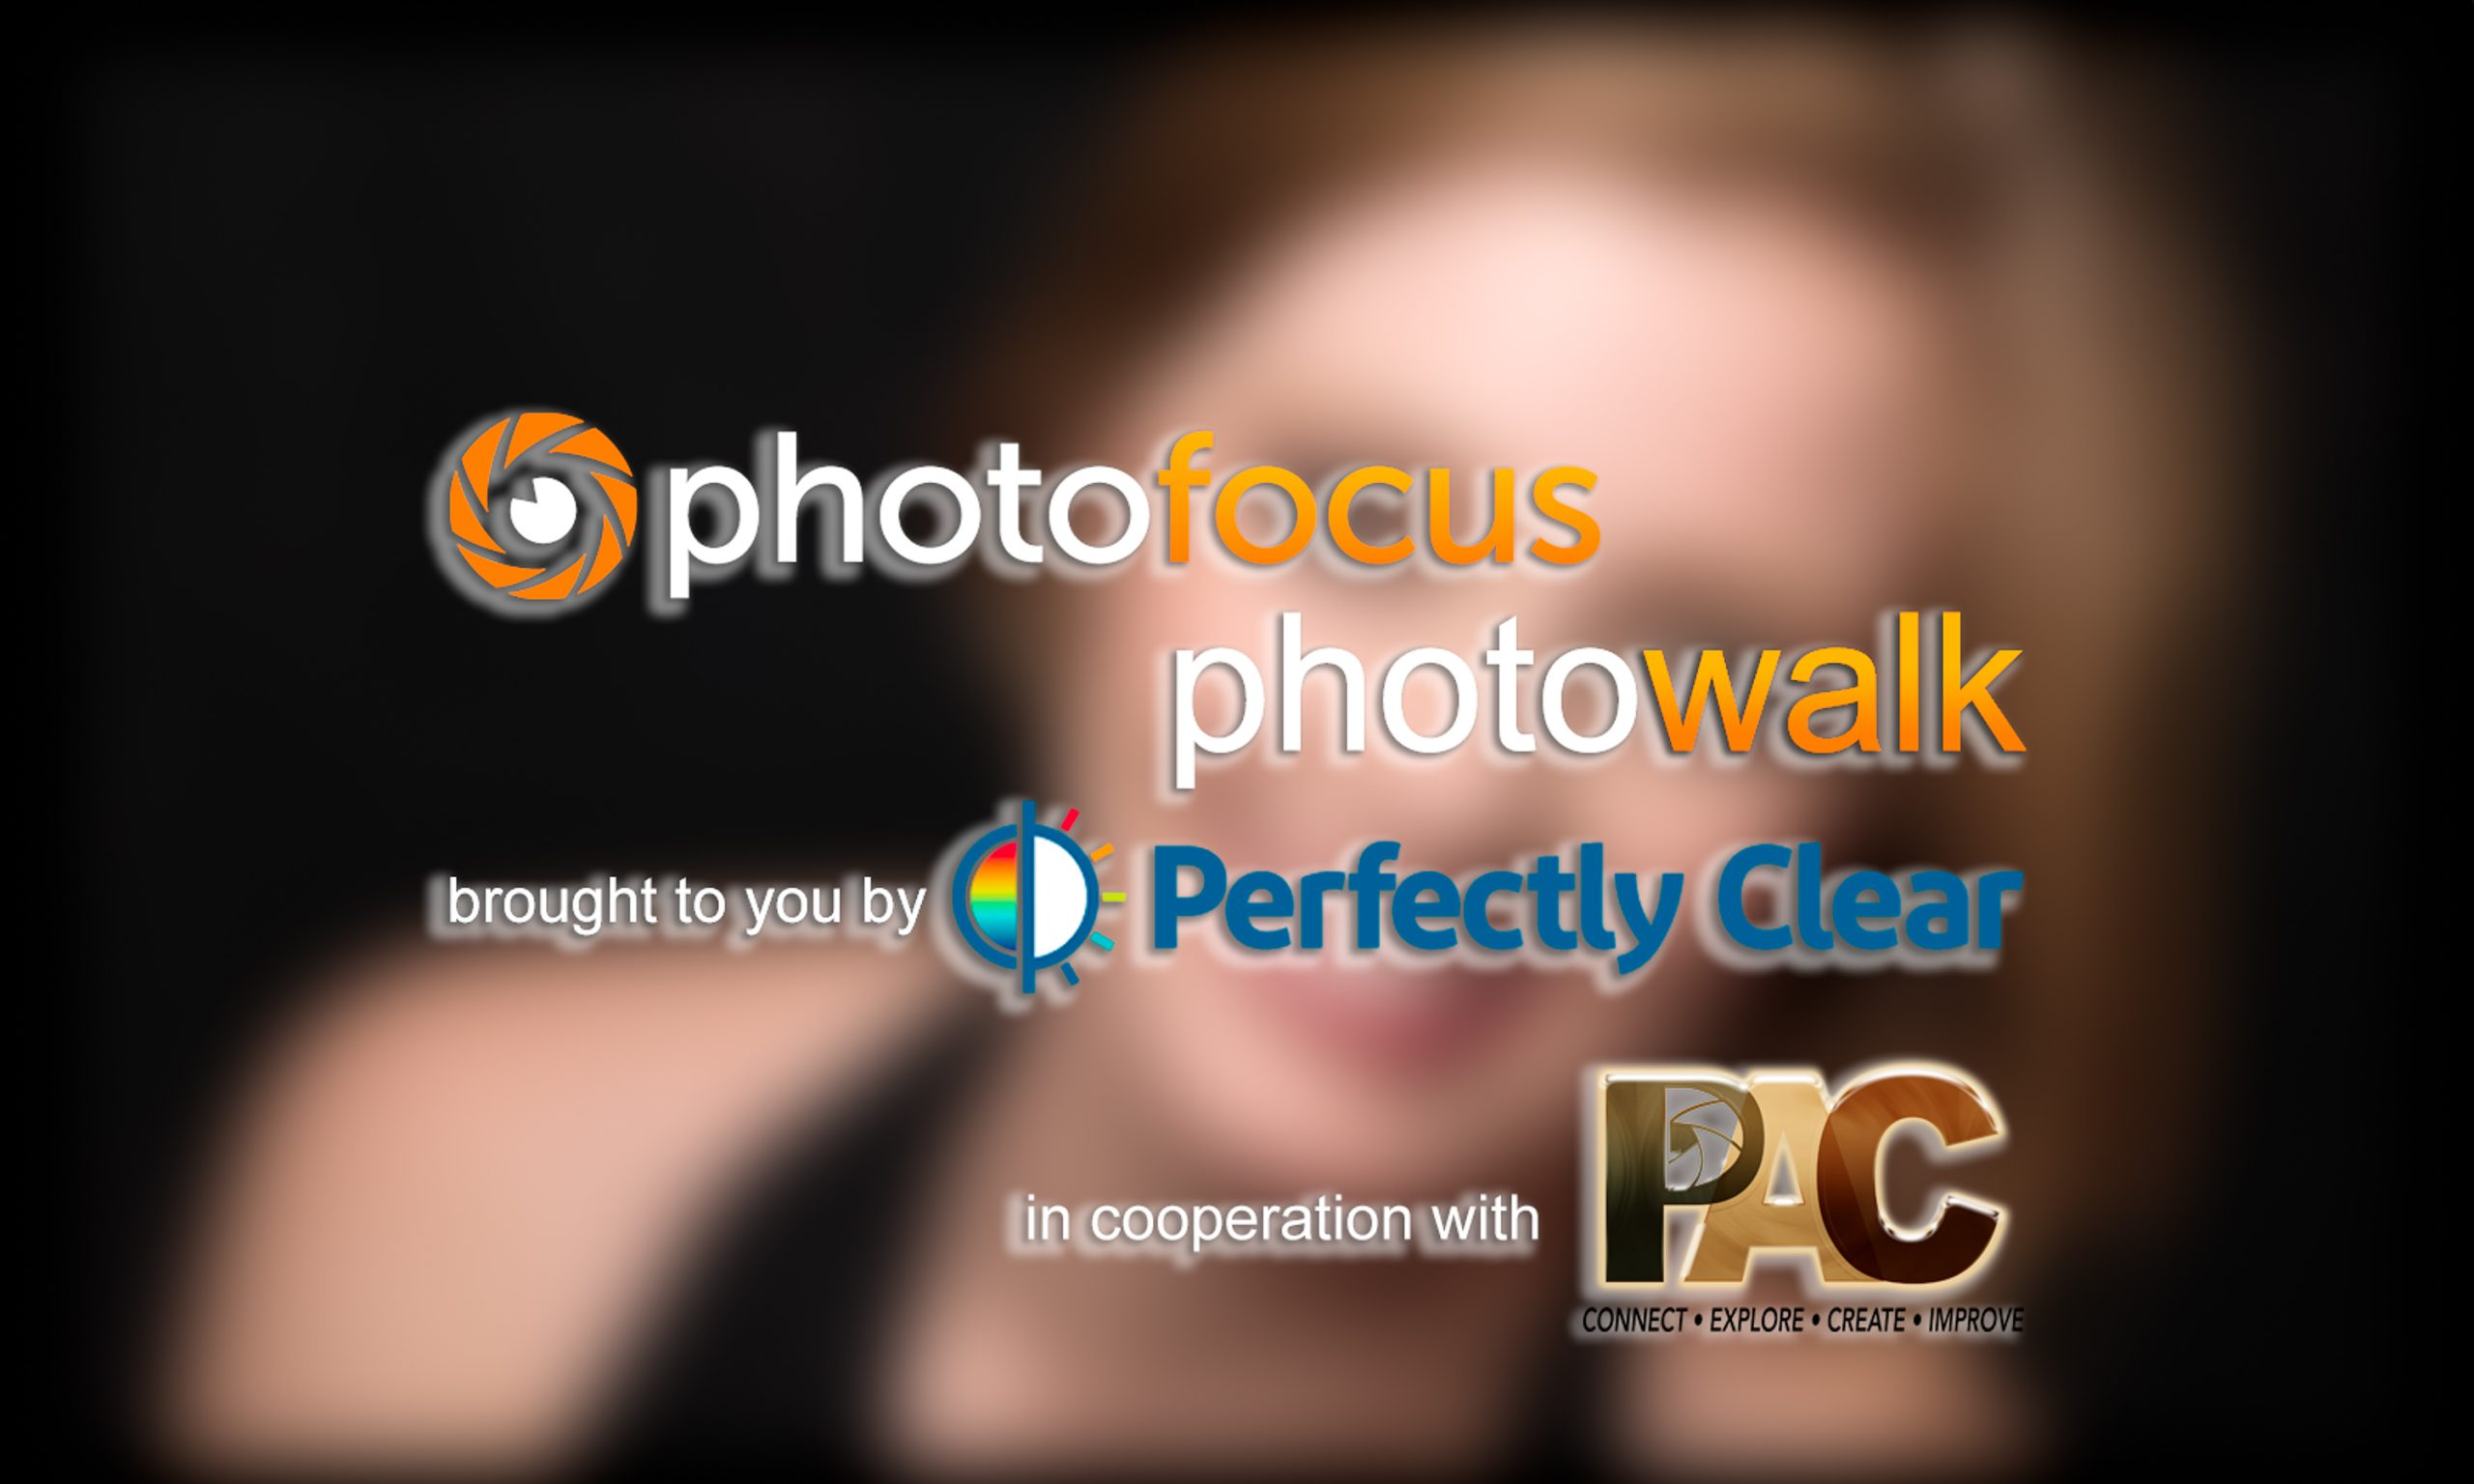 PhotofocusPhotowalk Cover-1